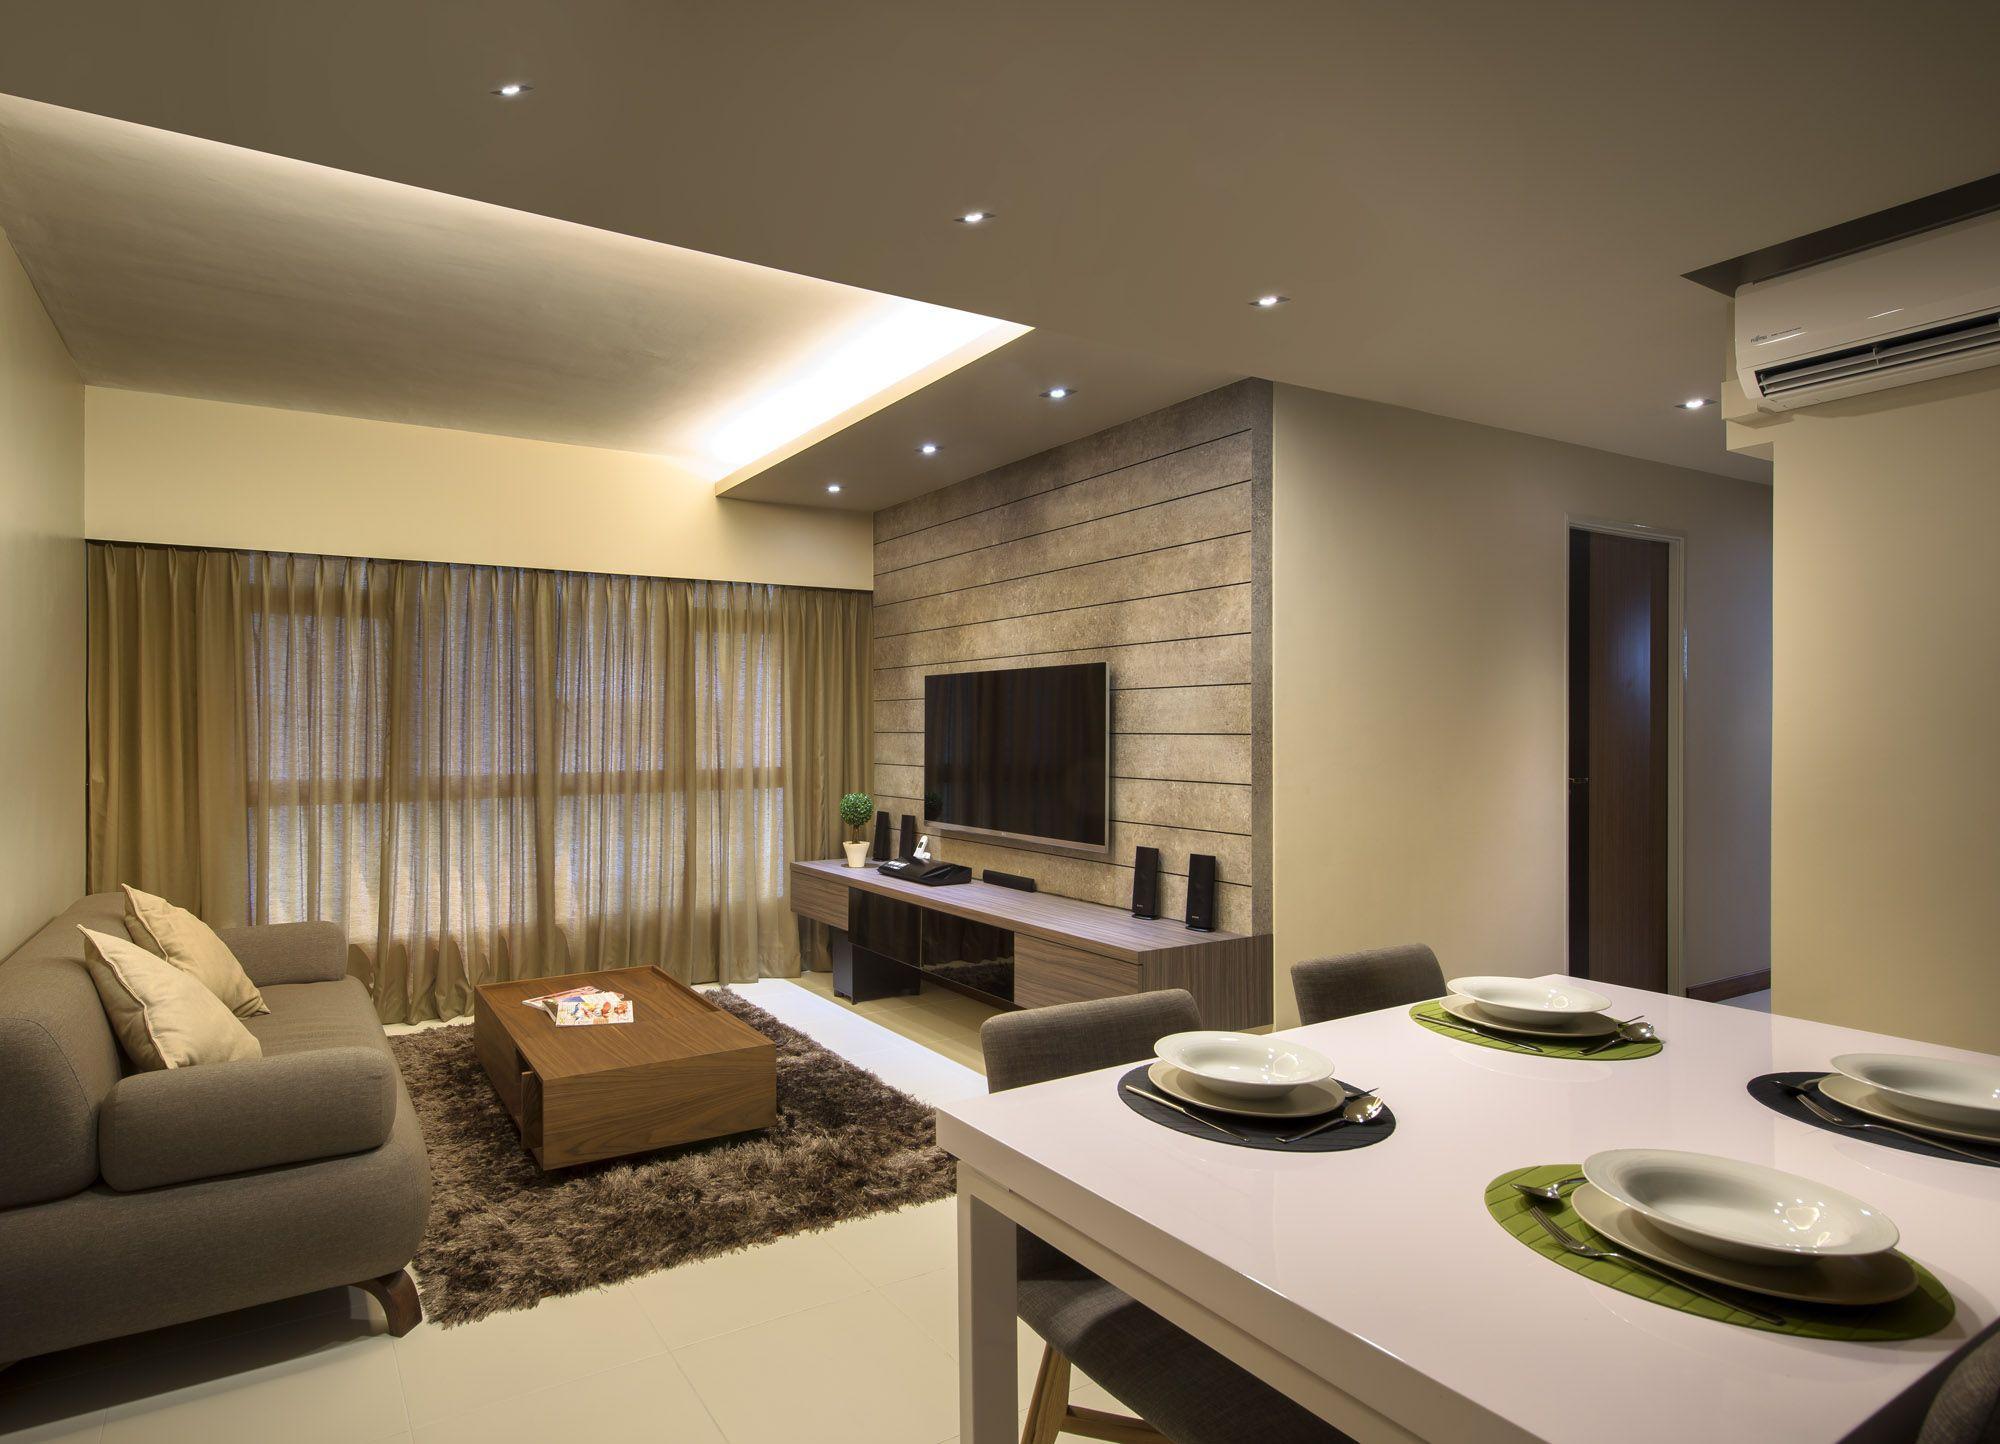 hdb living room | Reno ideas | Pinterest | Living rooms, Room and Nest